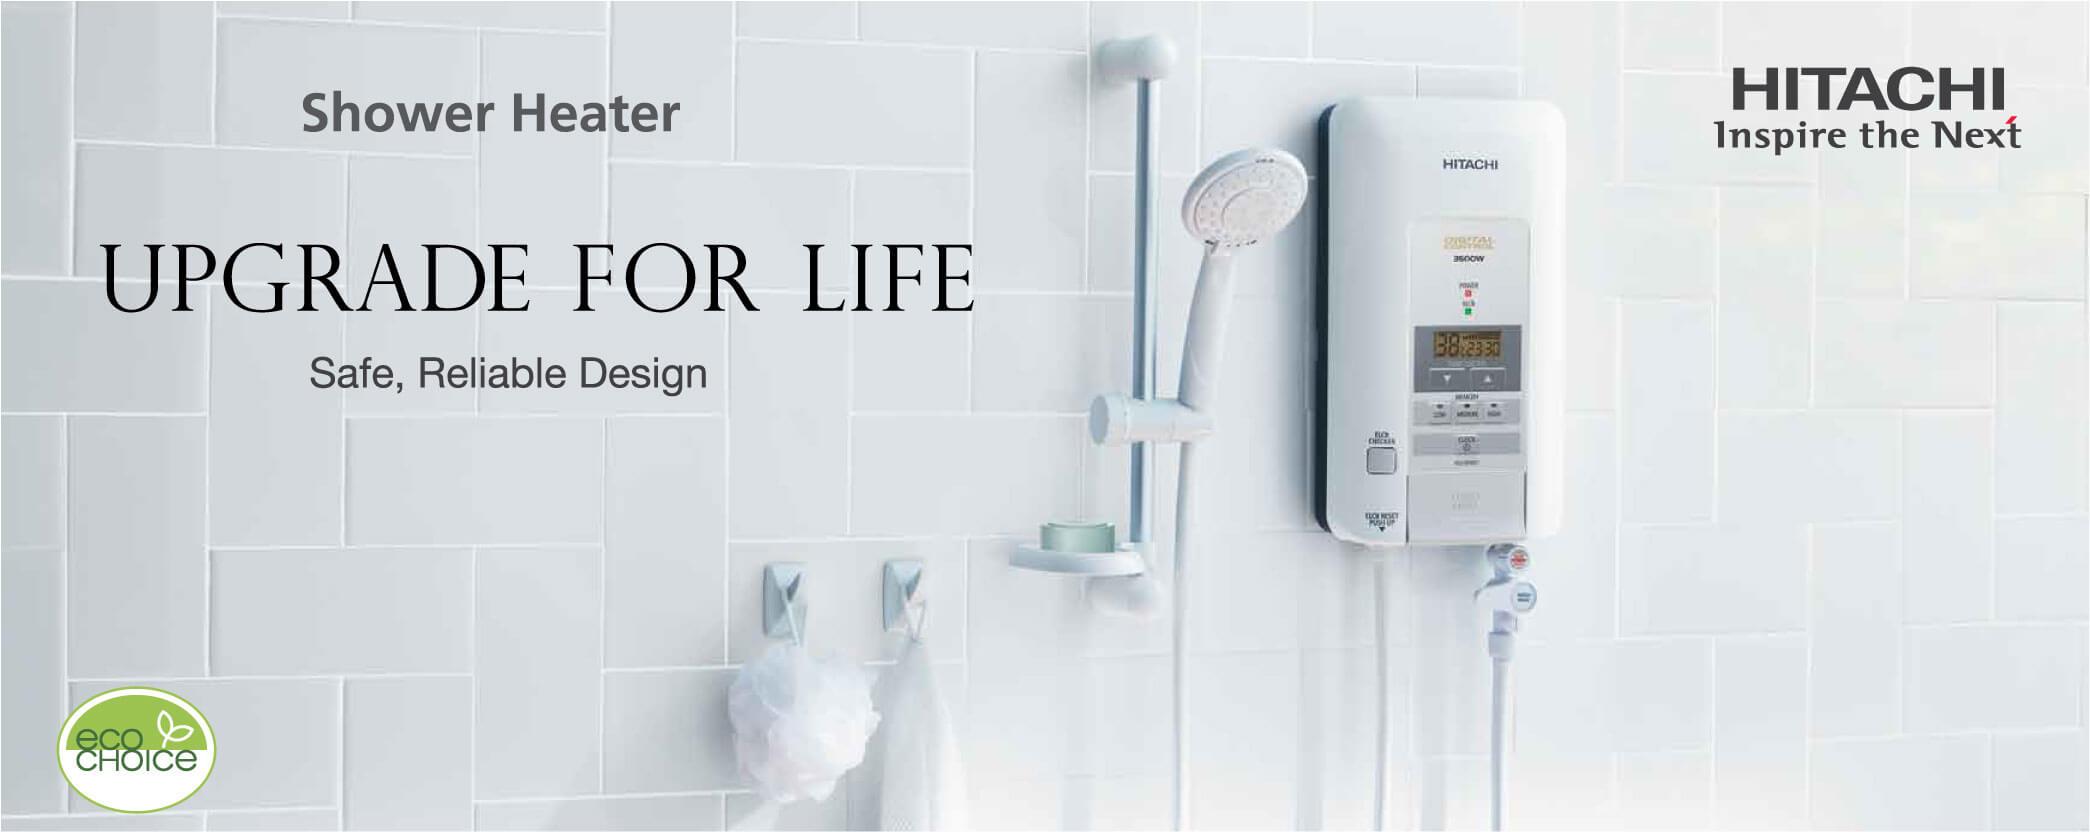 shower-heater-3